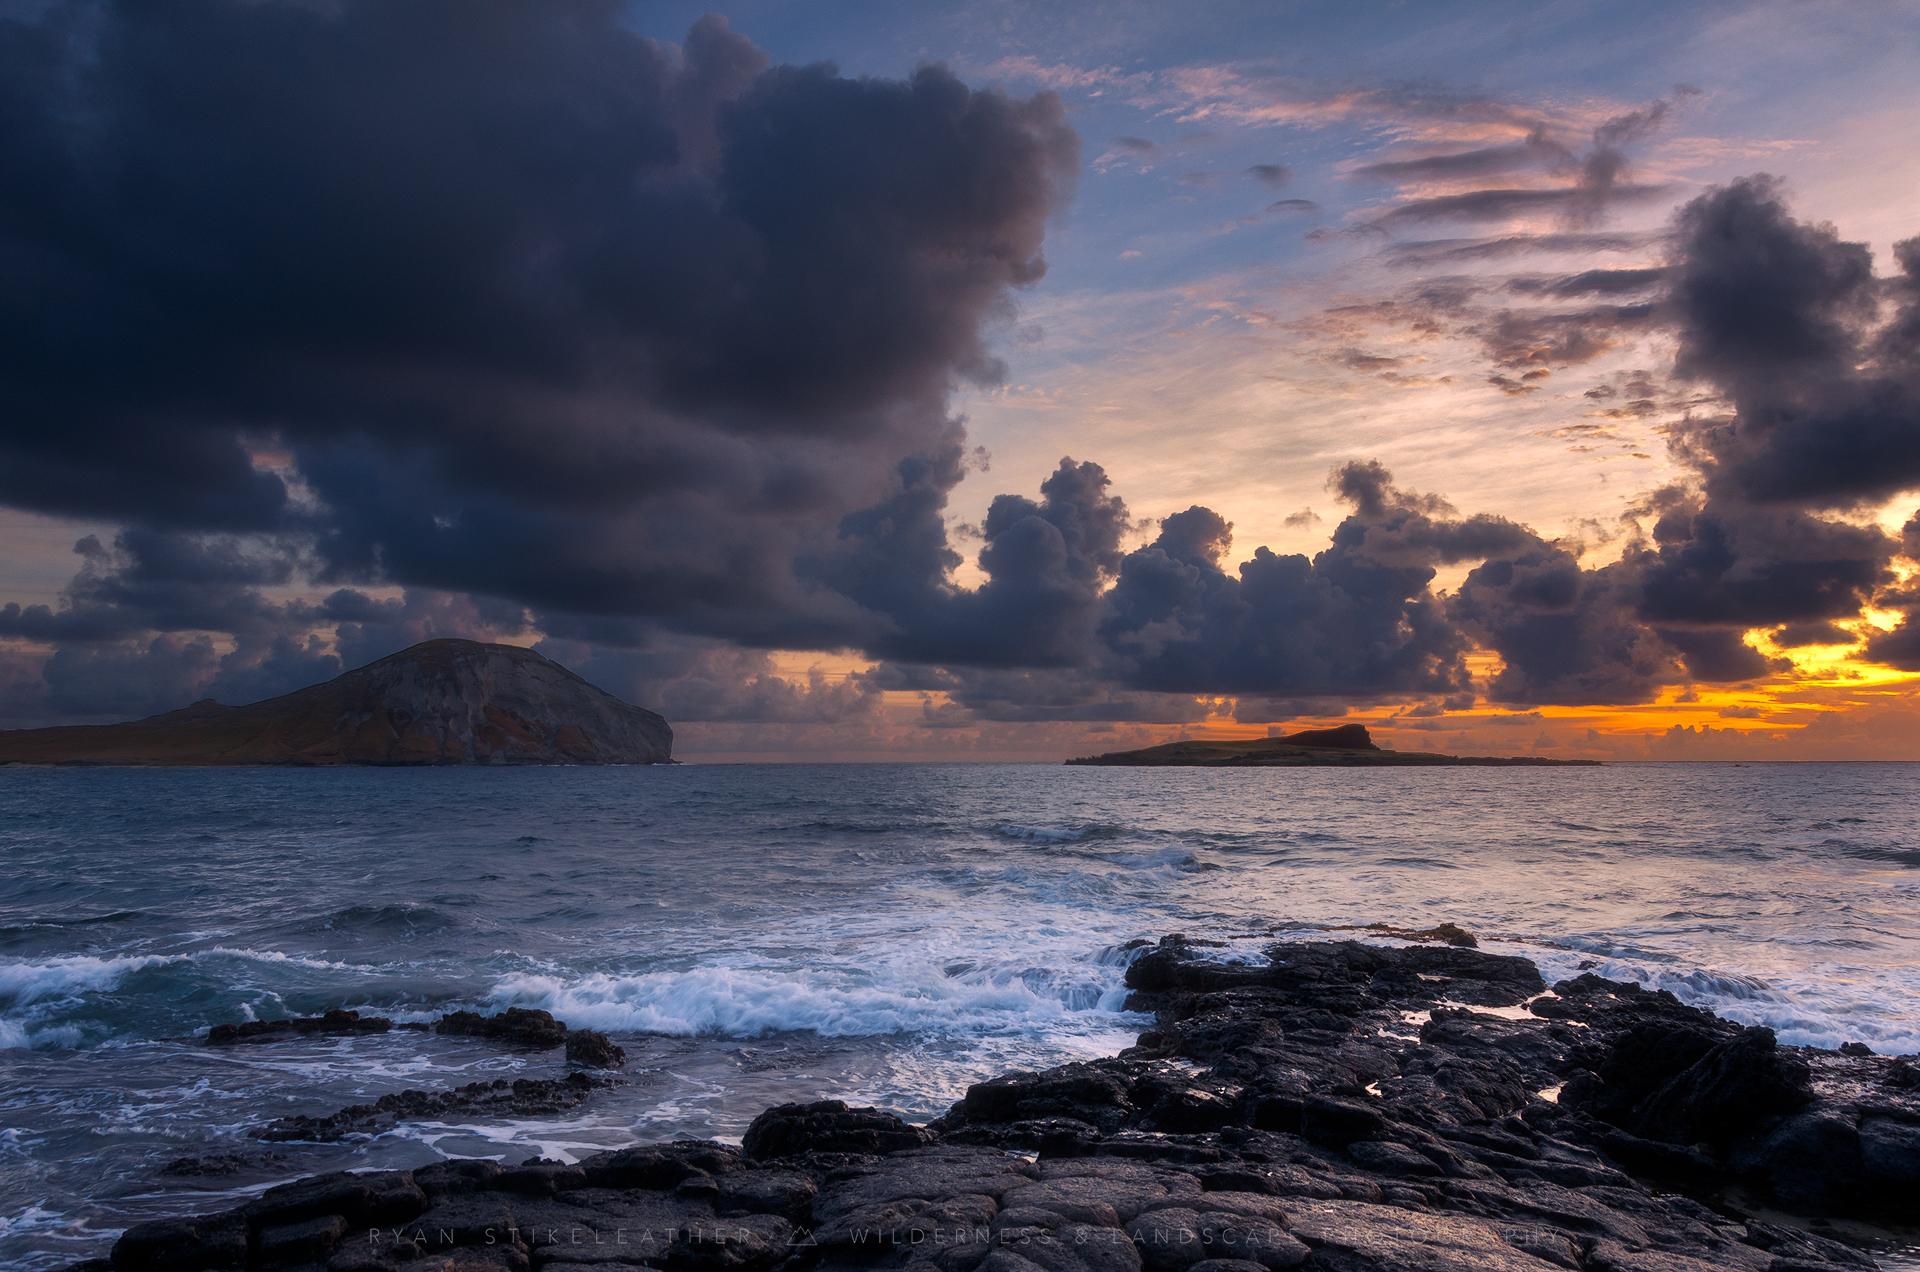 Makapuu Sunrise—photo by  Ryan Stikeleather